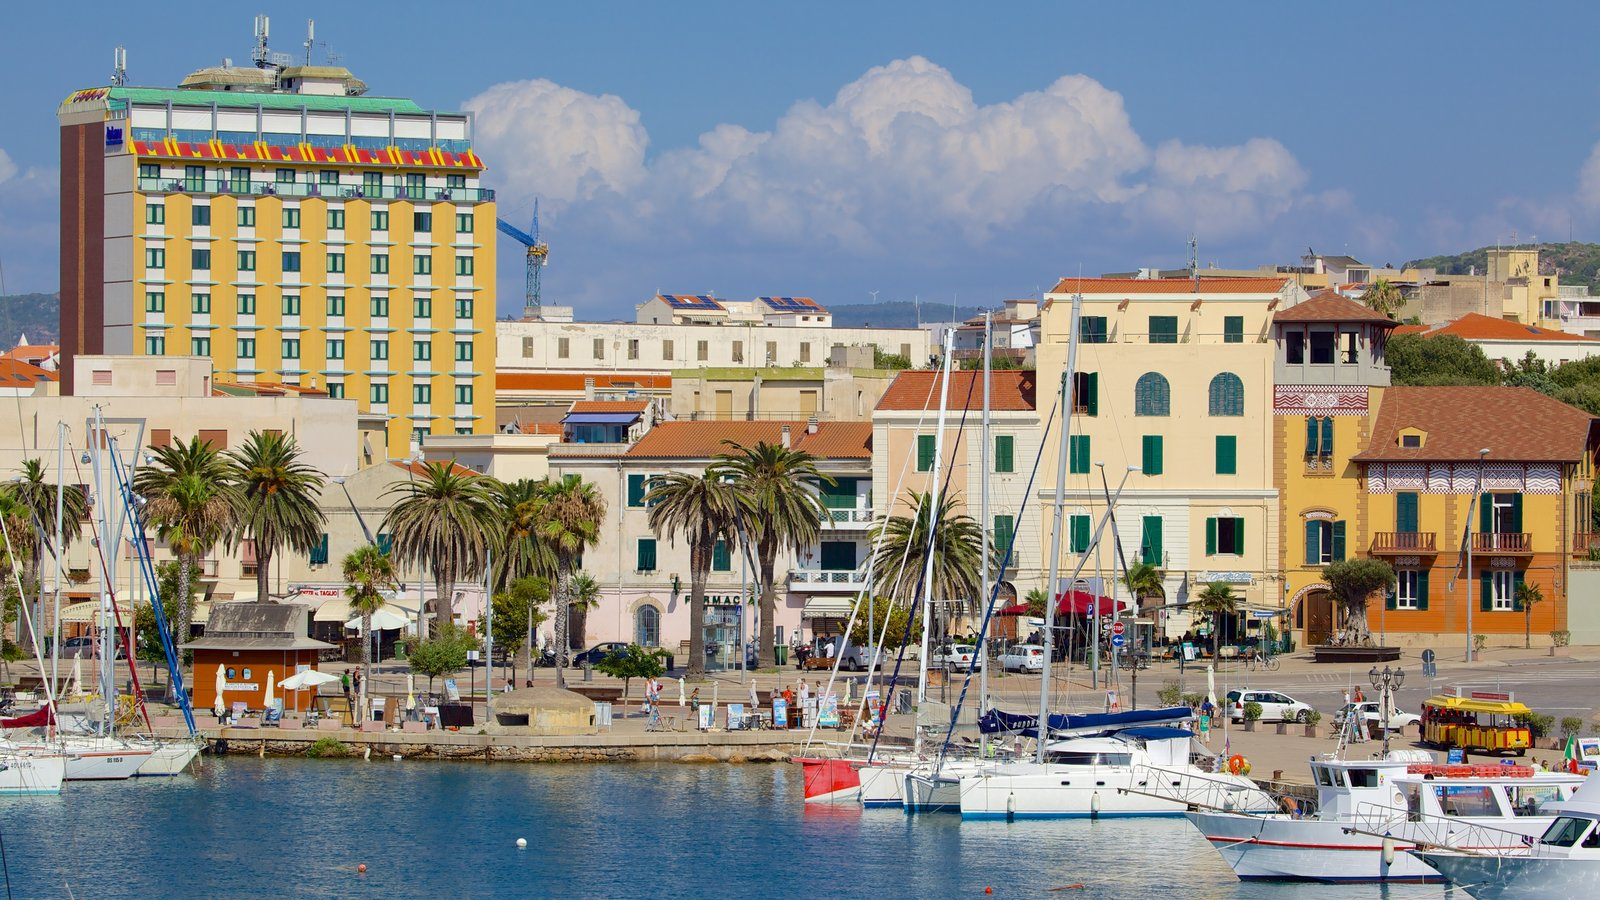 Alghero - Northern Sardinia showing a coastal town and a marina